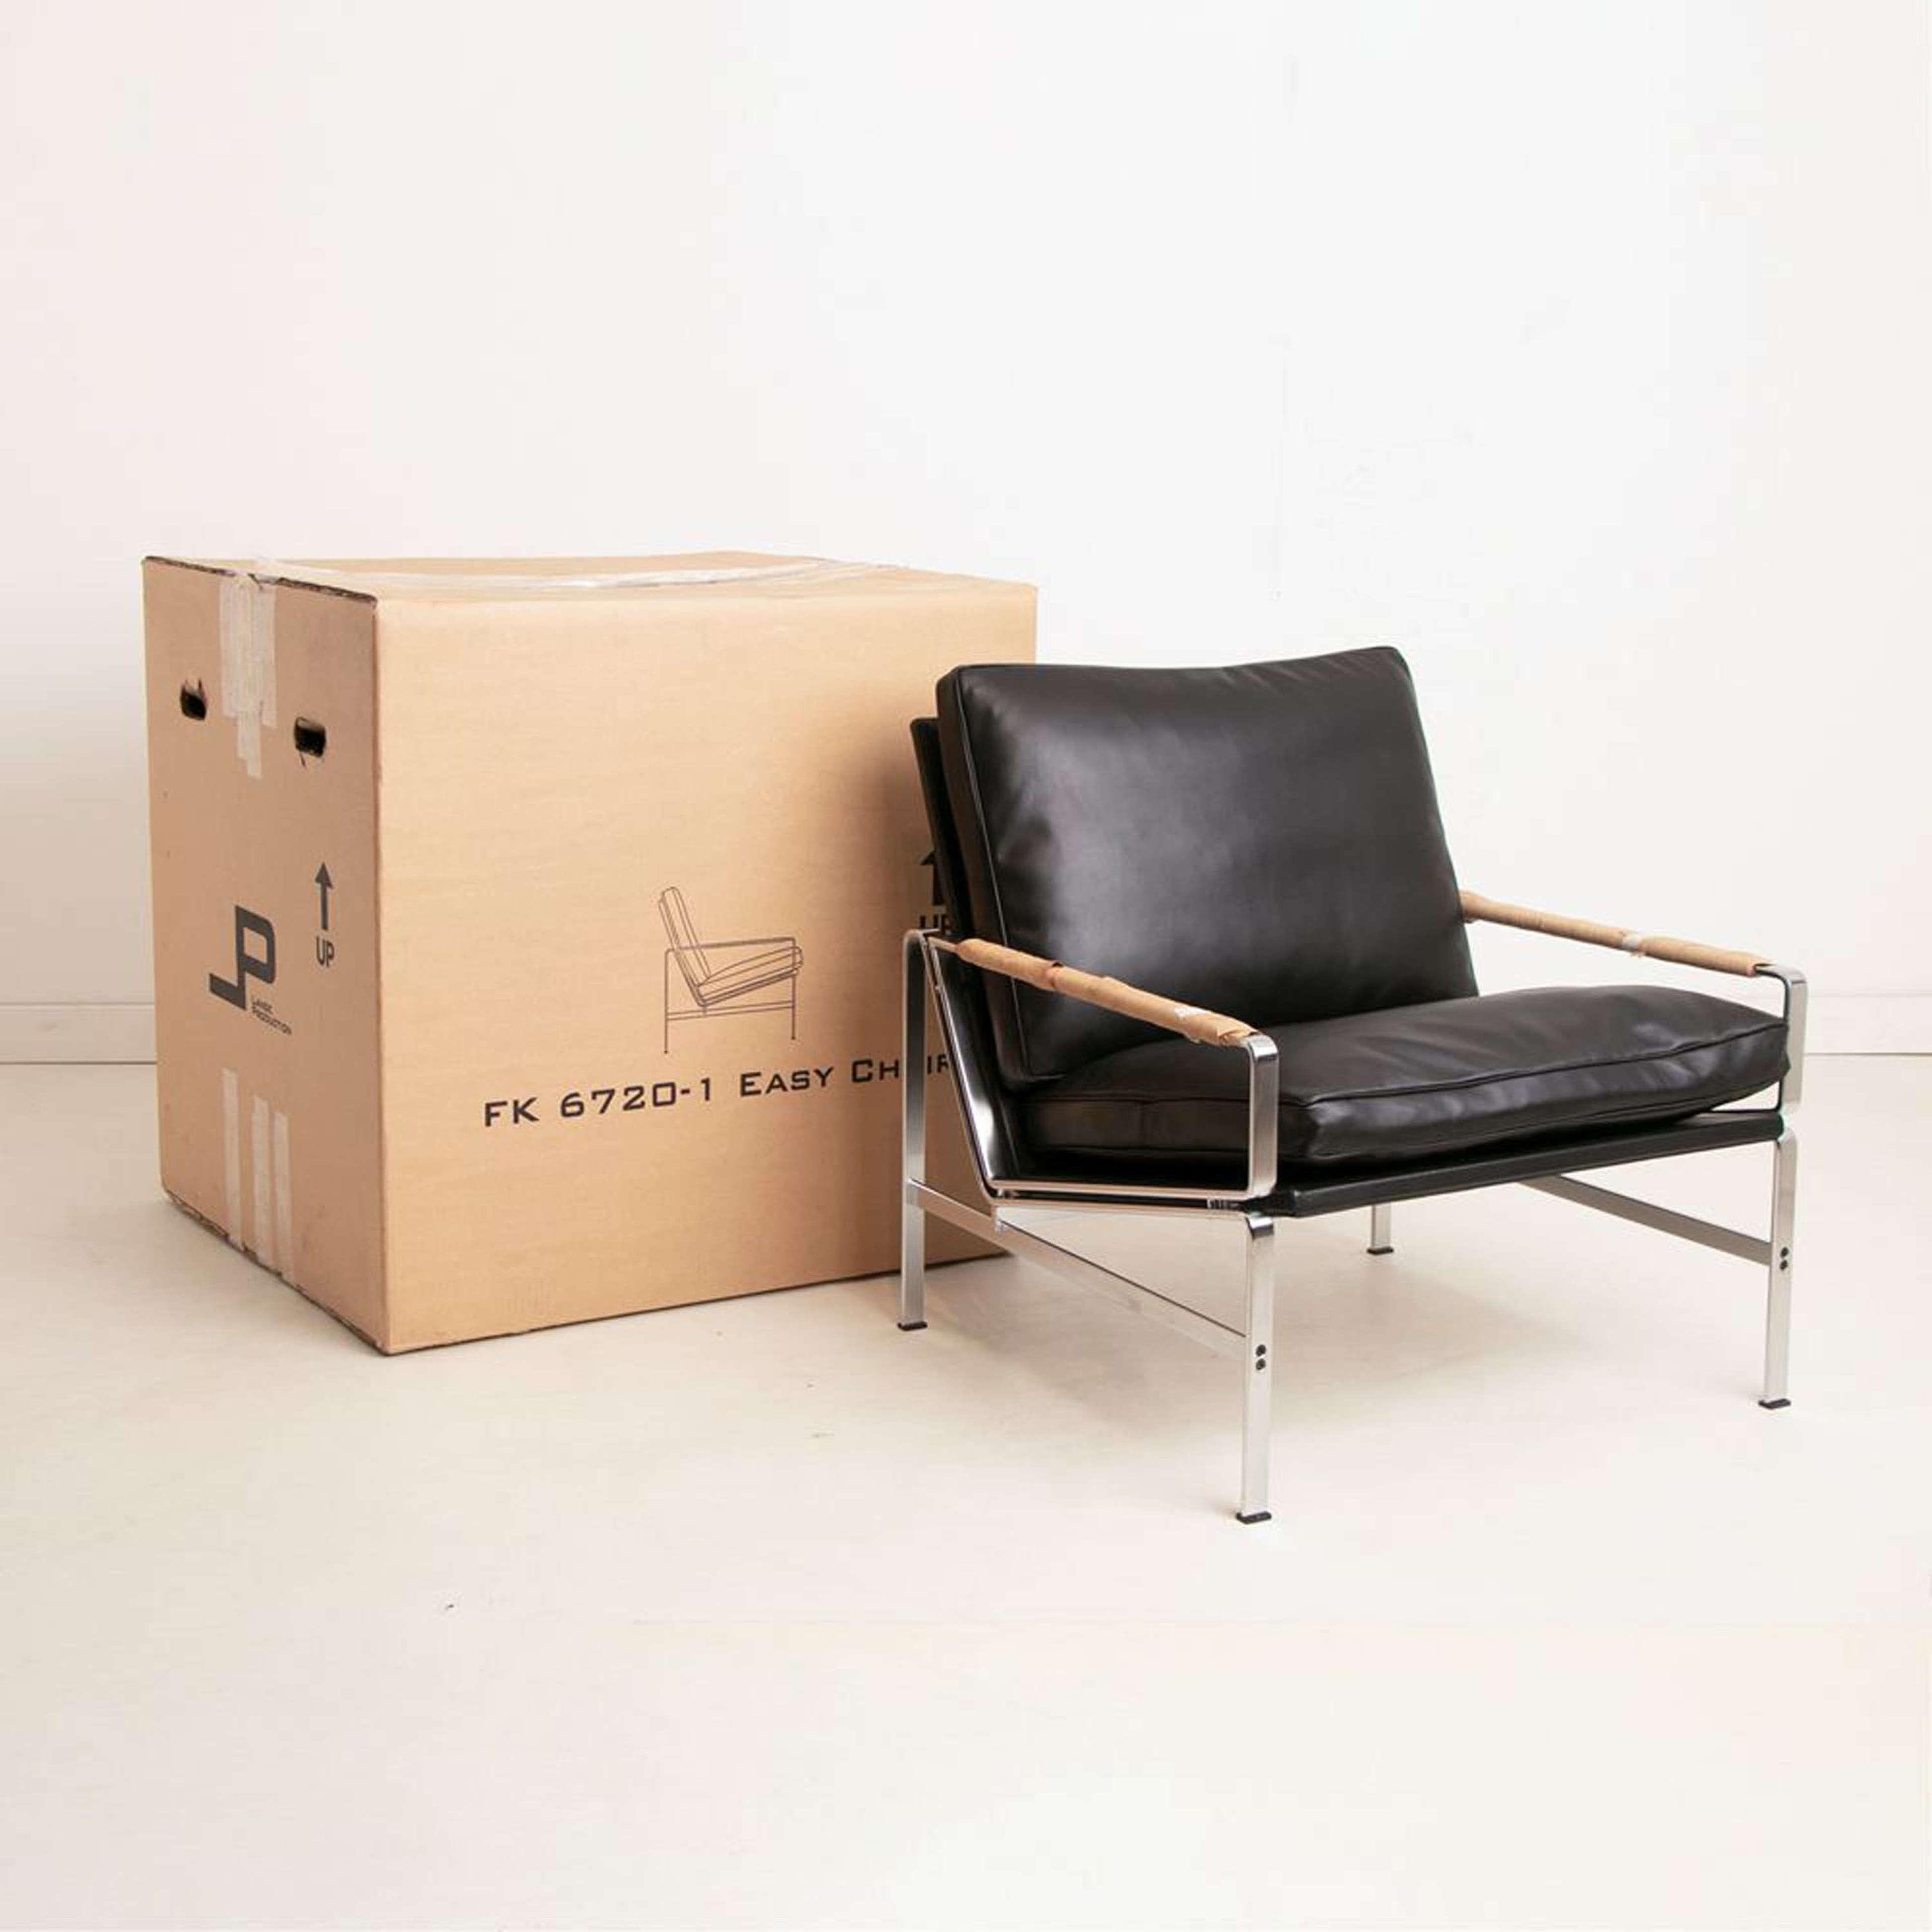 Preben Fabricius & Jorgen Kastholm FK 6720-1 Easy Chair